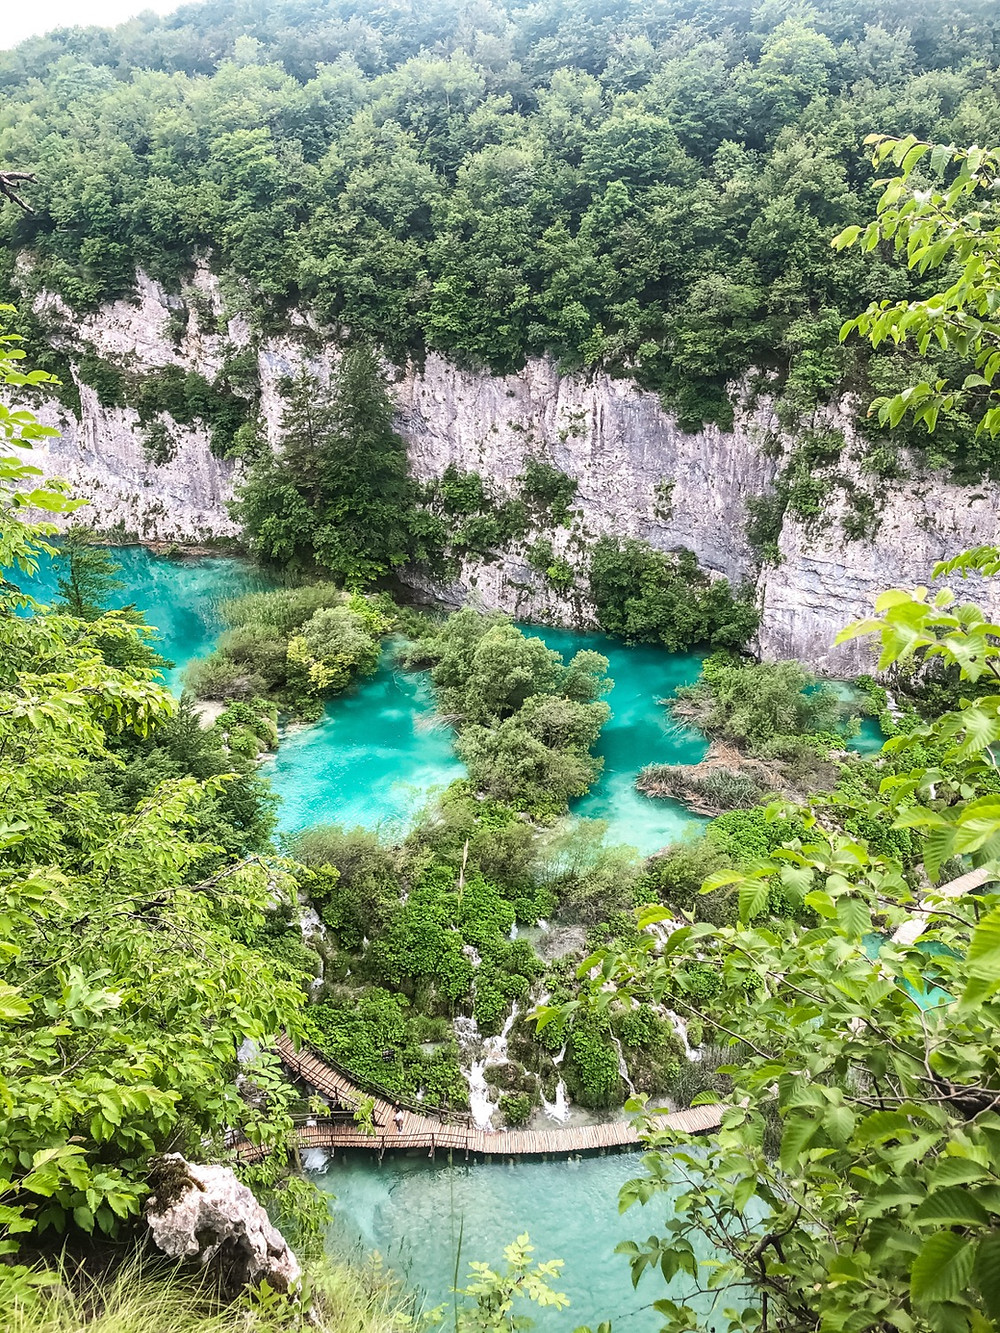 Kroatien-urlaub-plitvicer-seen-nationalpark-reisebericht